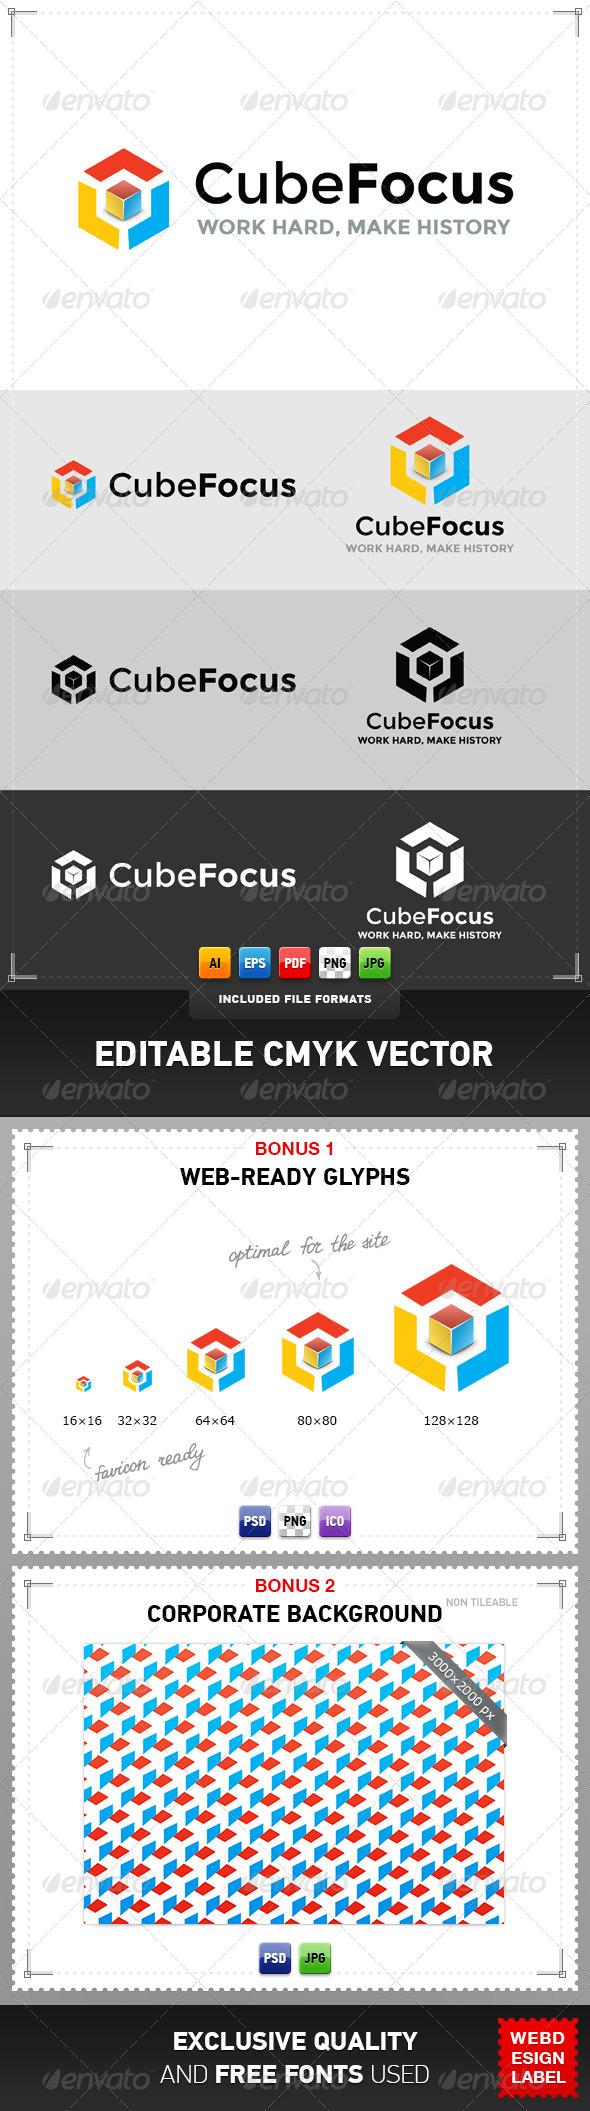 Cube Focus Logo - Objects Logo Templates